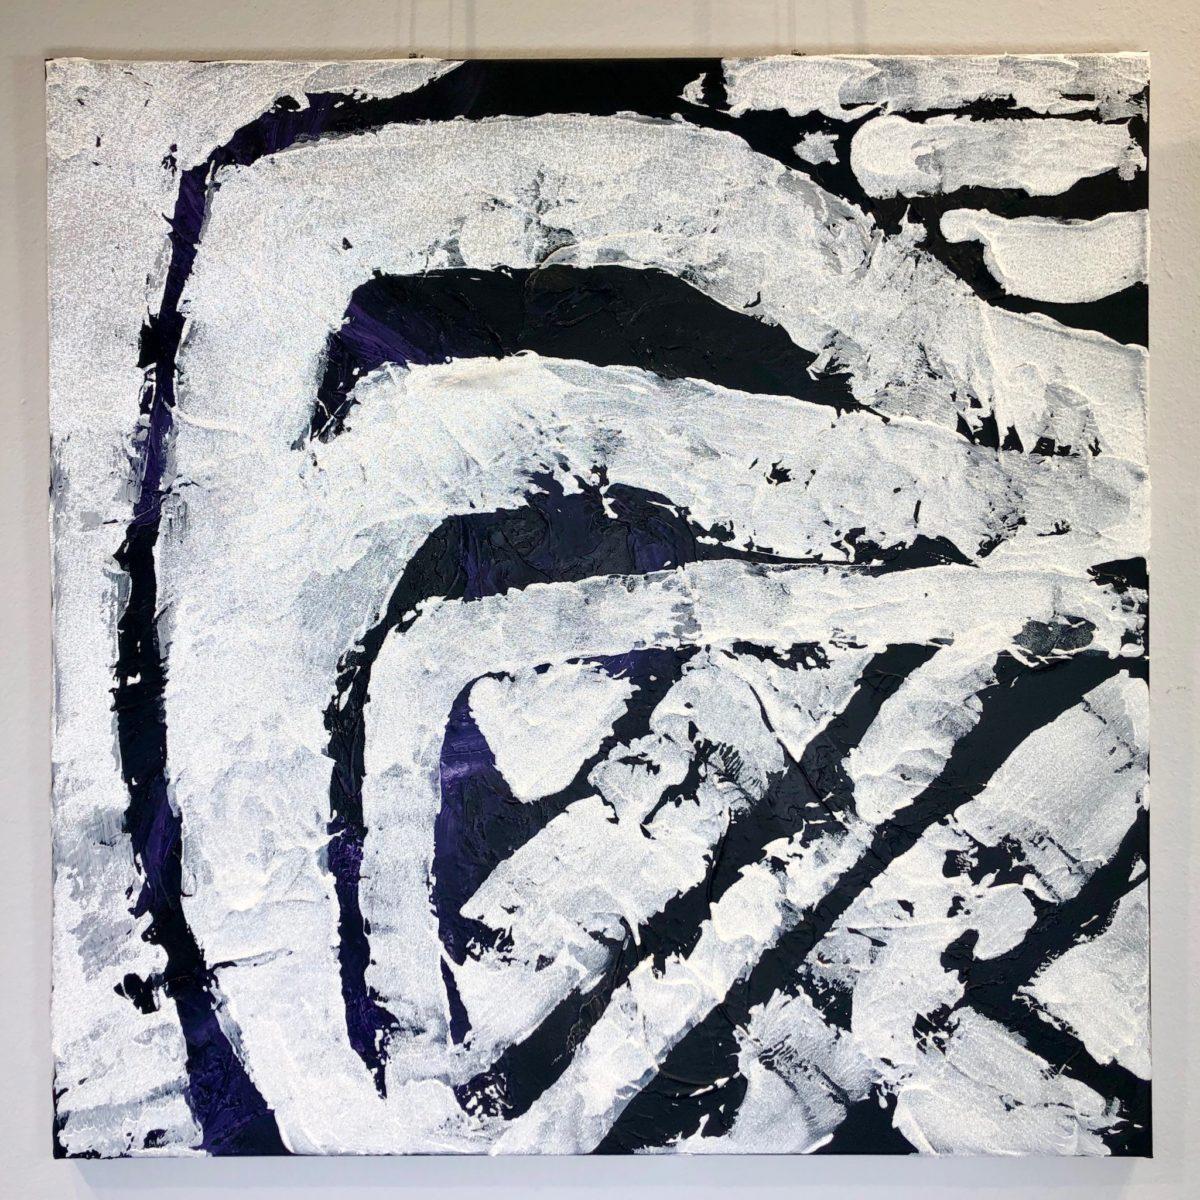 abstrakte-malerei-zaha_inspiration-2-1